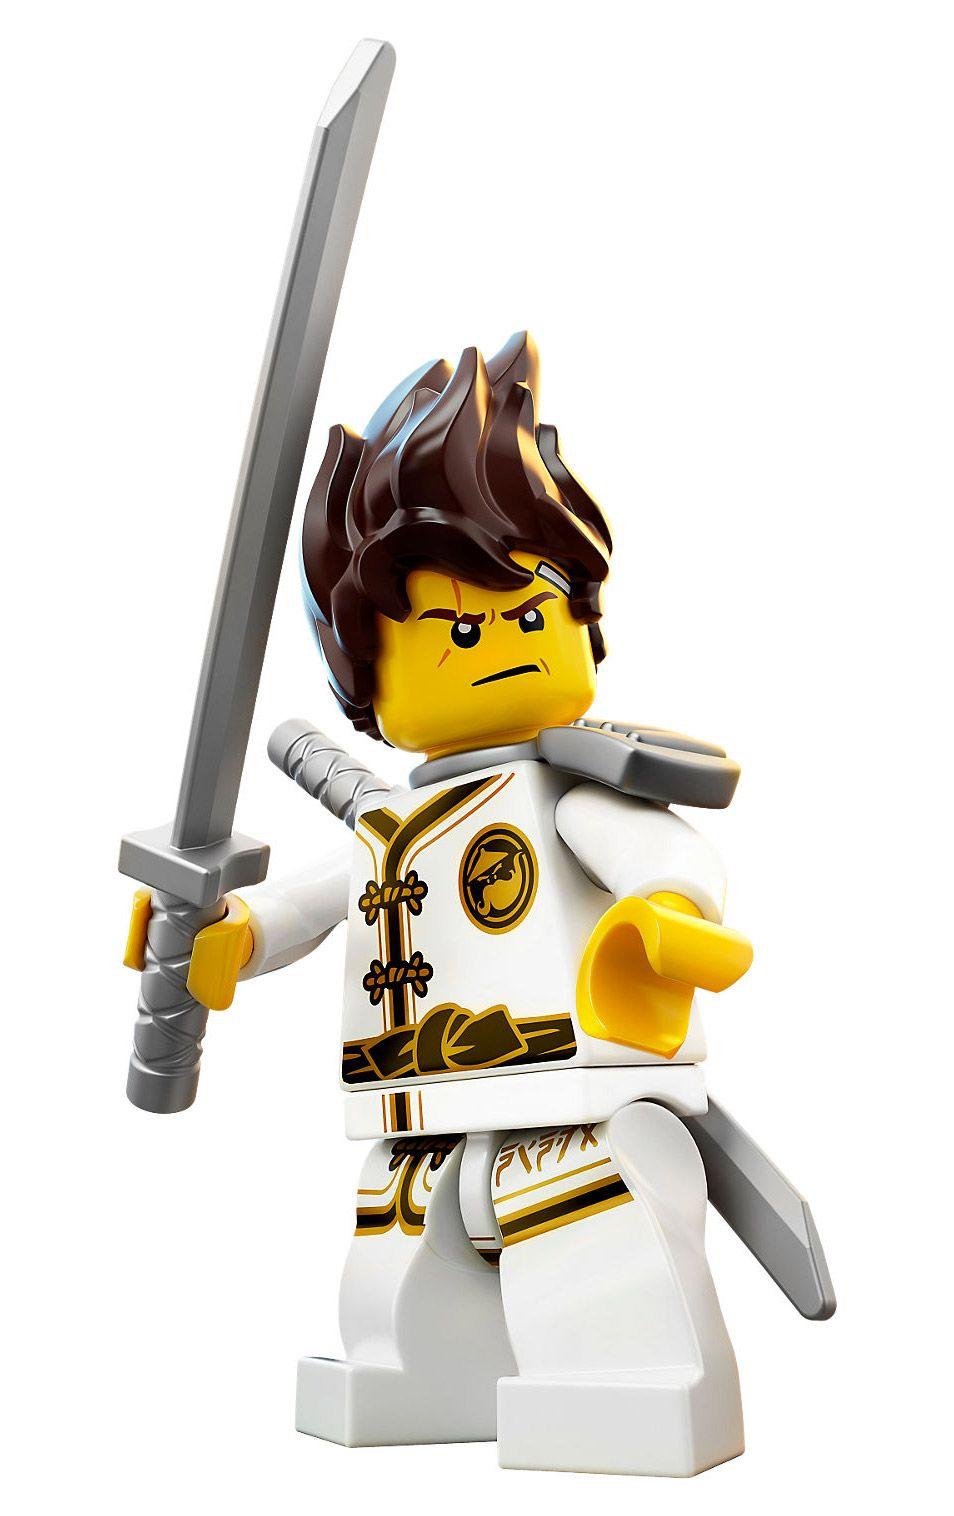 Lego ninjago 853702 pas cher ensemble movie maker ninjago - Photo lego ninjago ...